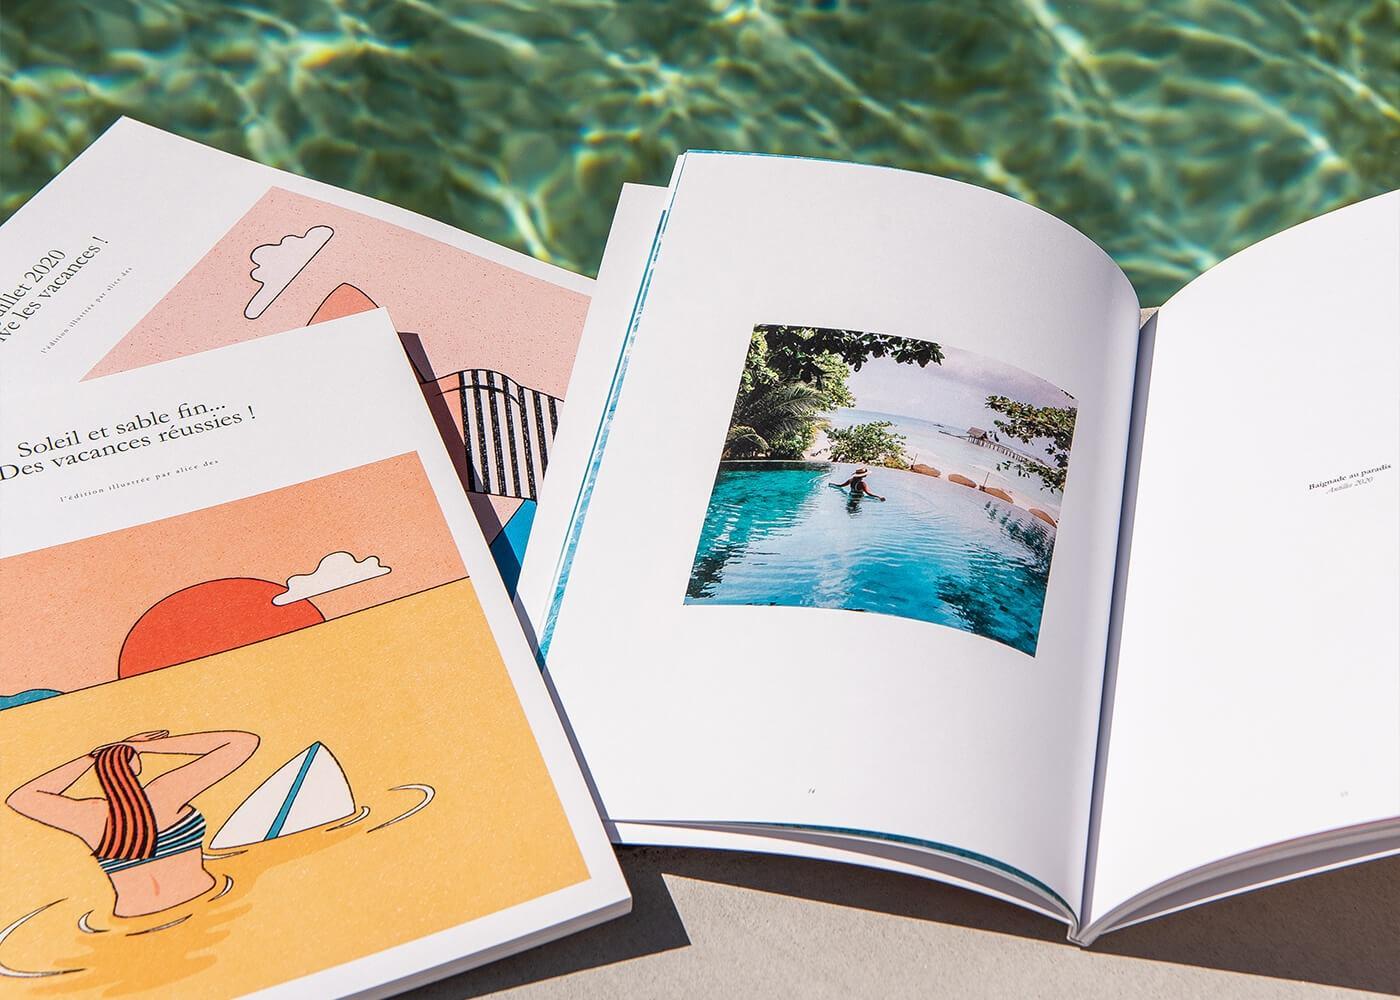 Innocence - Edition - Impression - Photos - Illustration - Alice Des - Album Photos - Album photo vacances